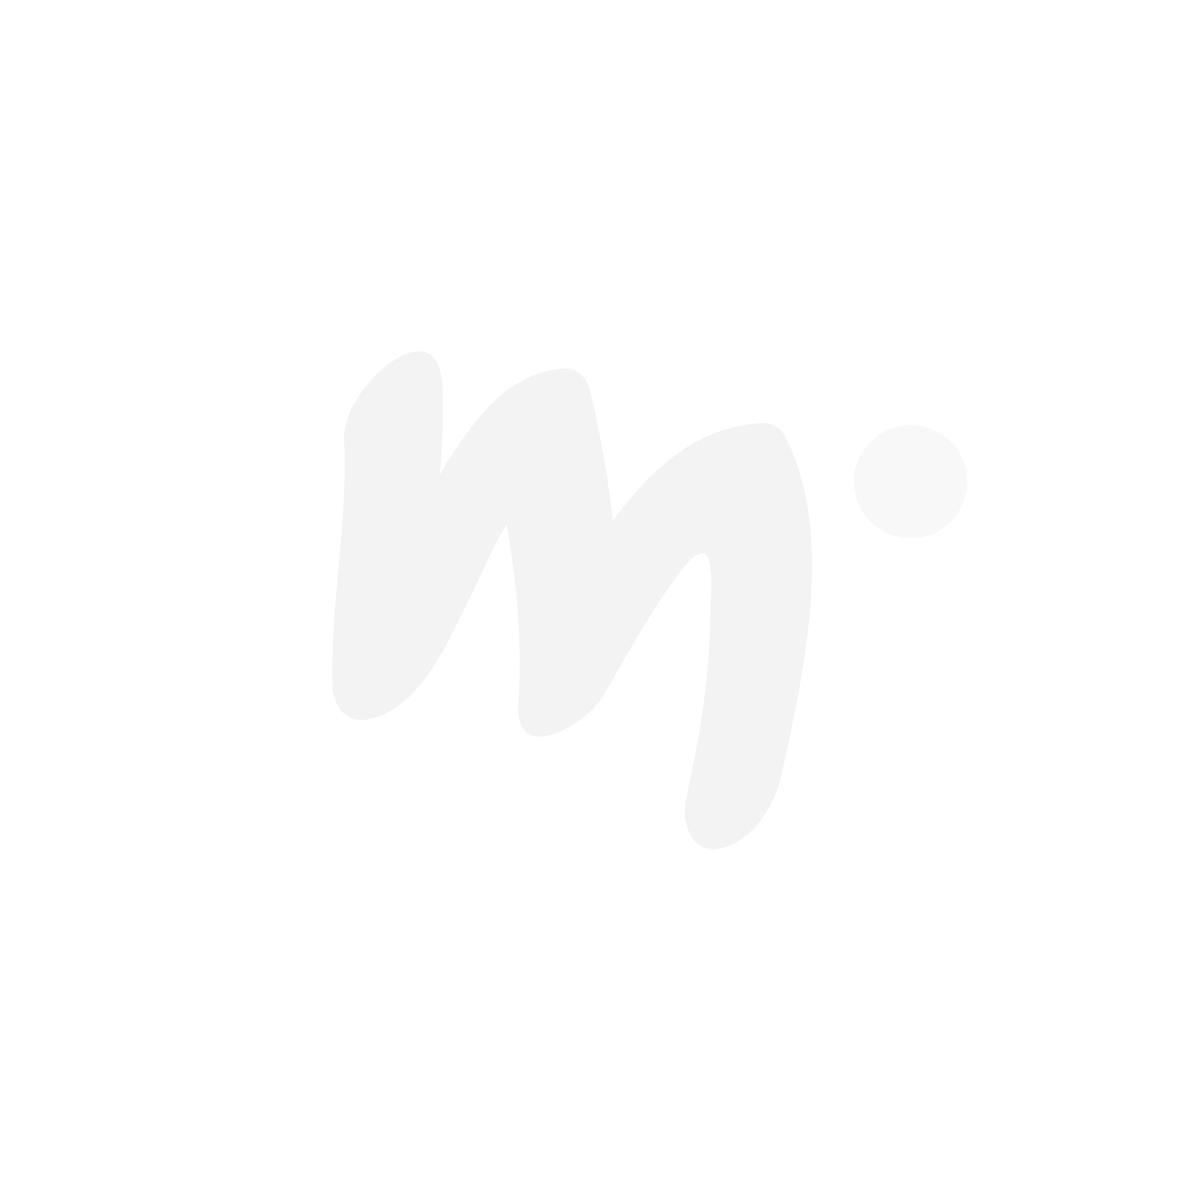 Peppi Pitkätossu Kekkeri-tunika mintunvihreä